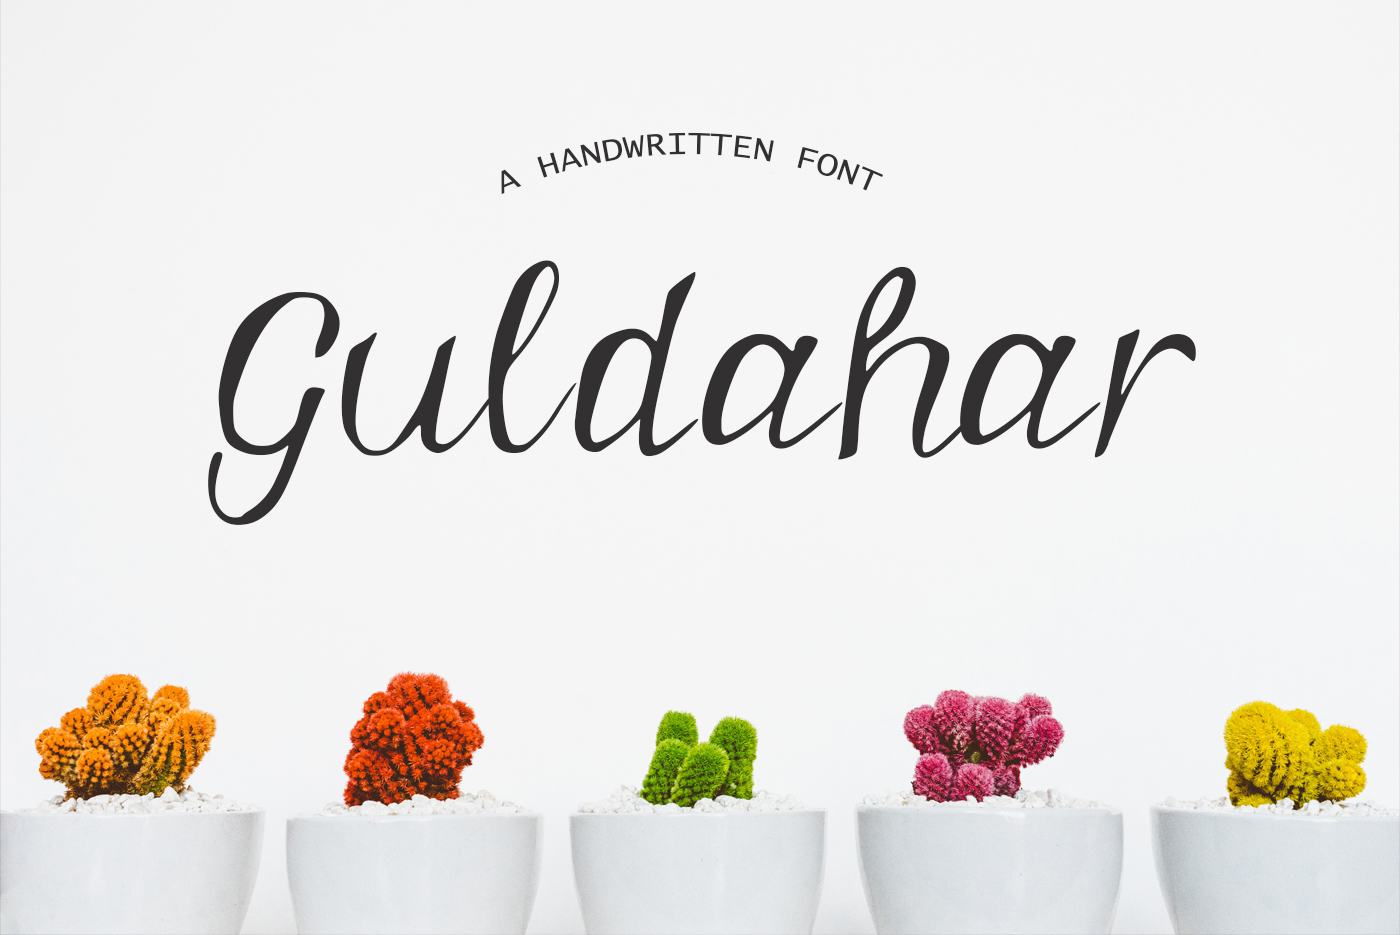 15 Creative Handmade Fonts Bundle example image 9